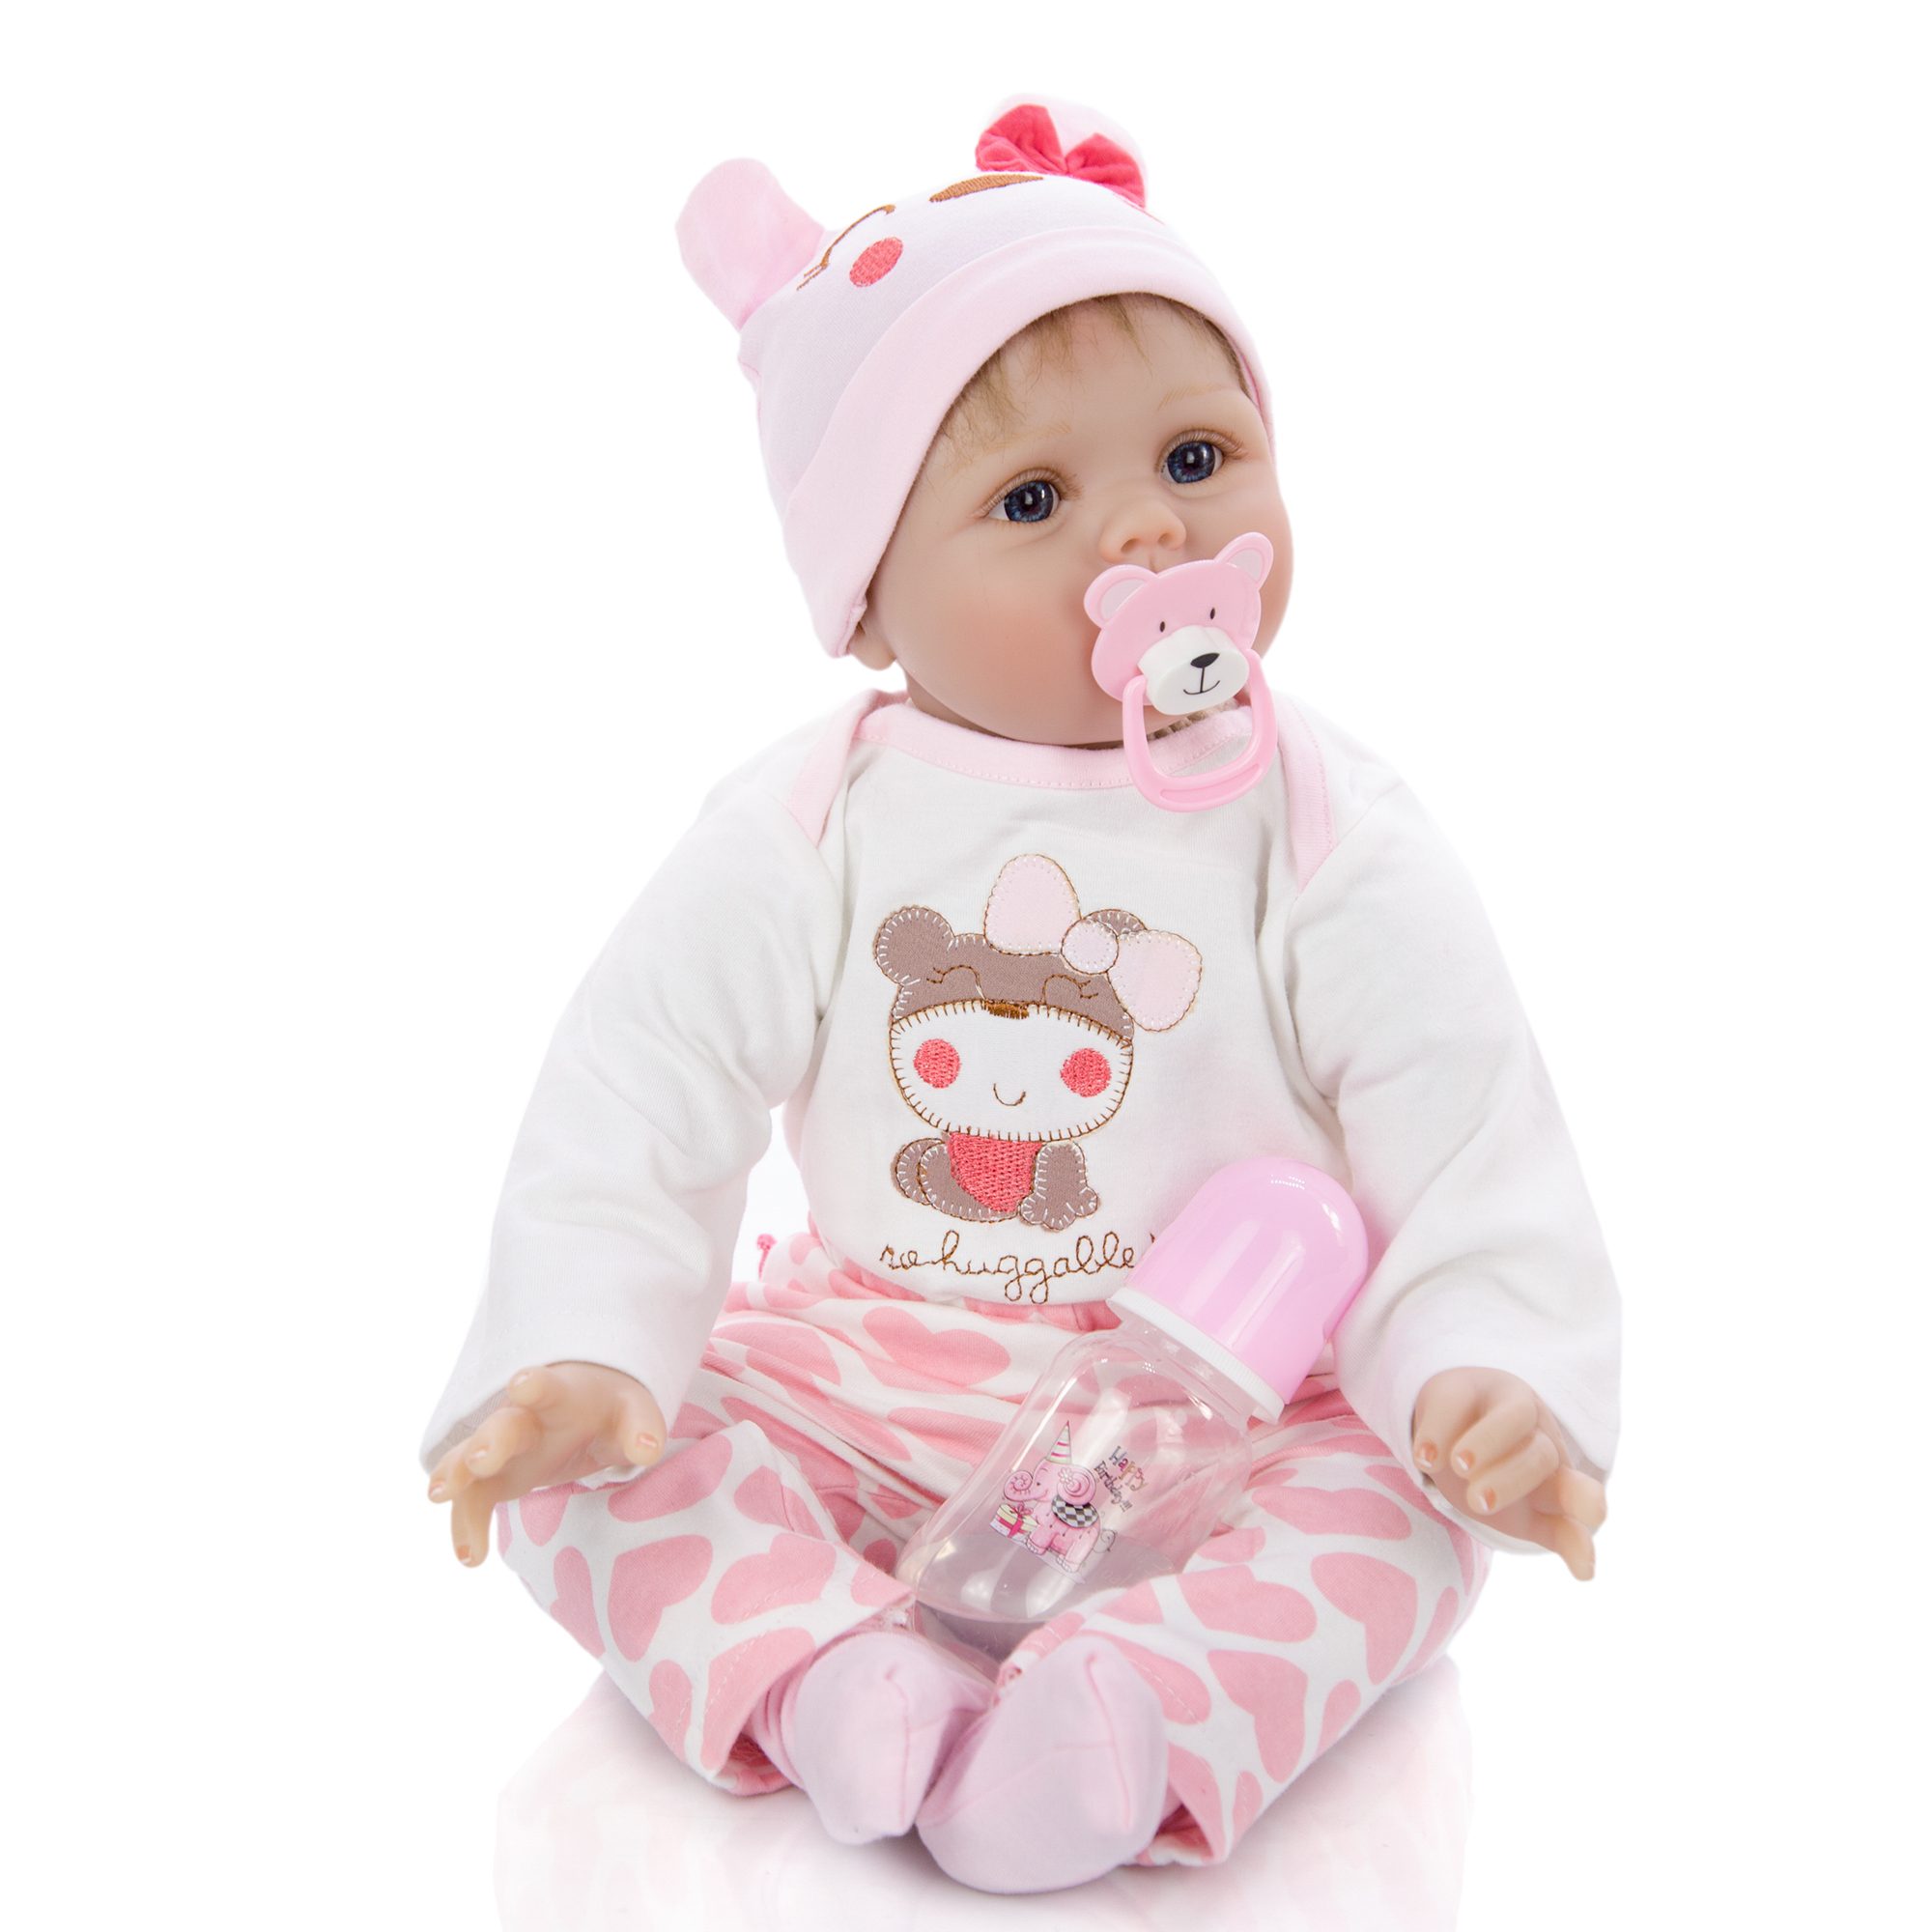 "Lifelike 22/"" Toddler Reborn Baby Dolls Rooted Silicone Vinyl Newborn Baby Doll"